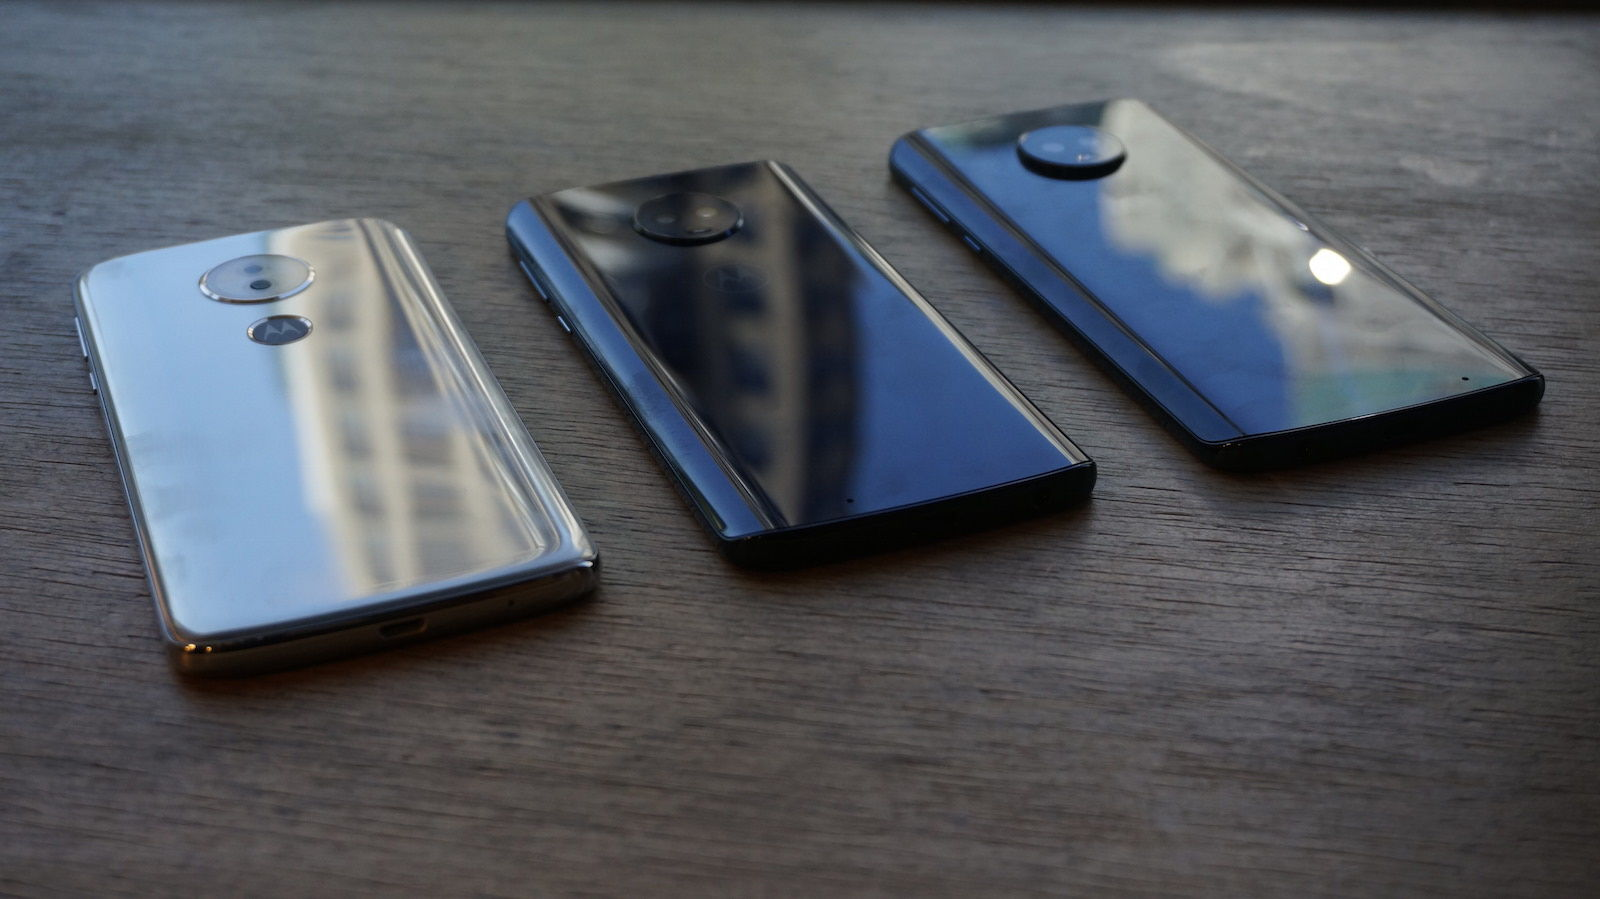 Moto G6,Moto G6 Plus和Moto G6 Play对比:有什么不同?